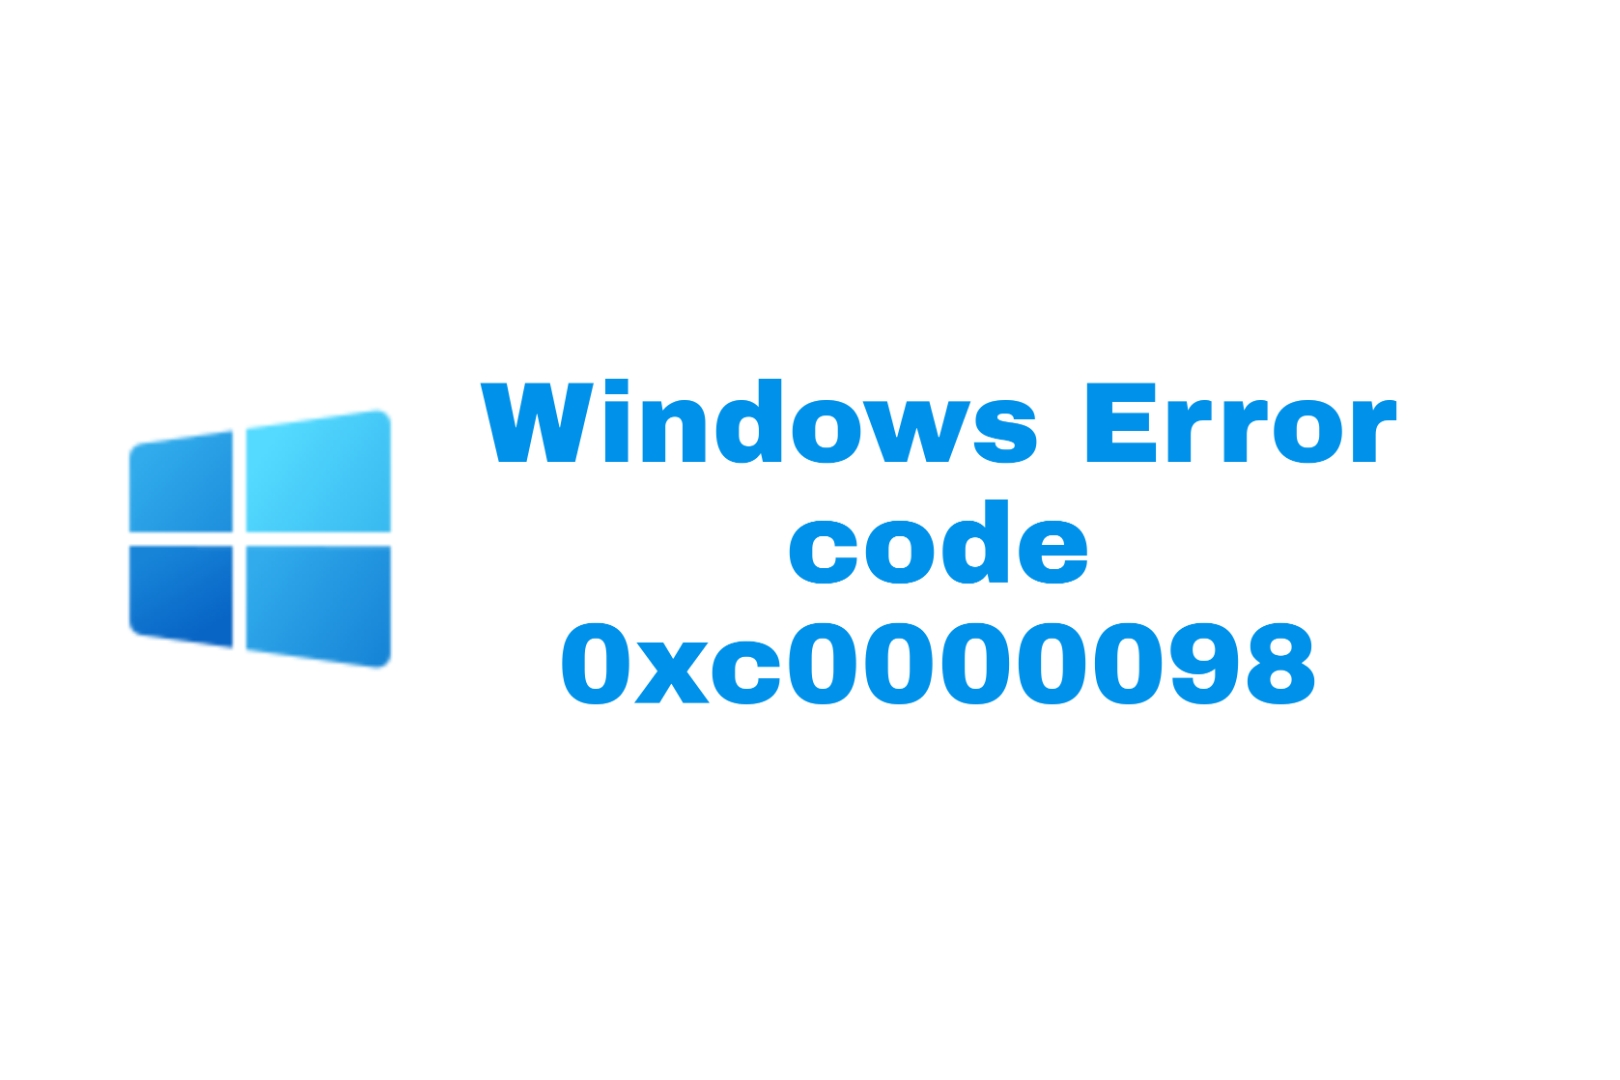 Windows 10 error code 0xc0000098